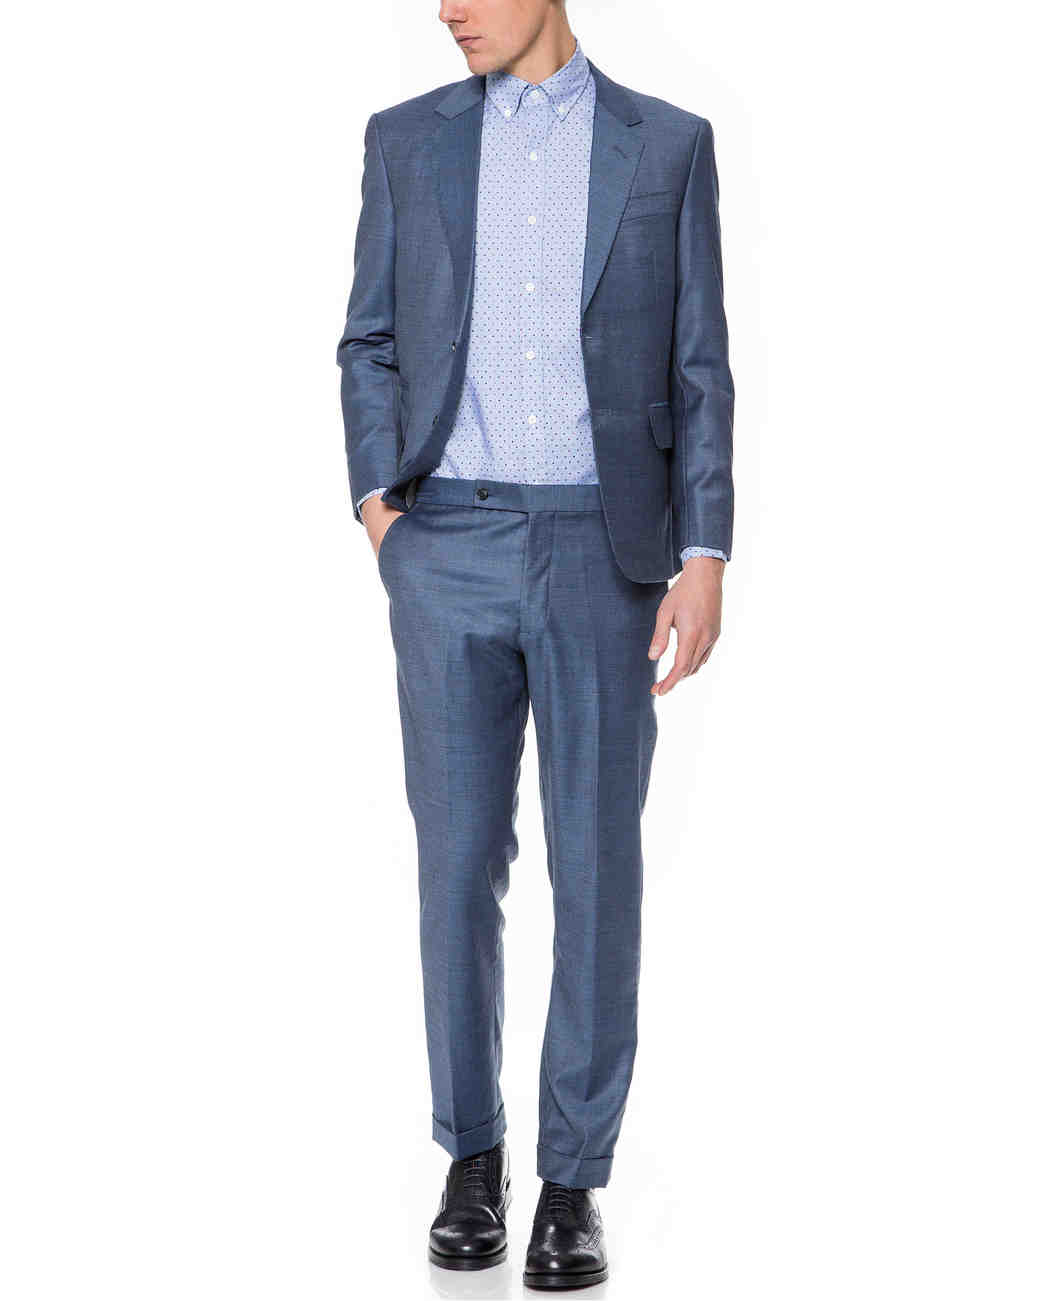 fall-groom-suits-east-dane-brooklyn-tailors-sharkskin-suit-1014.jpg